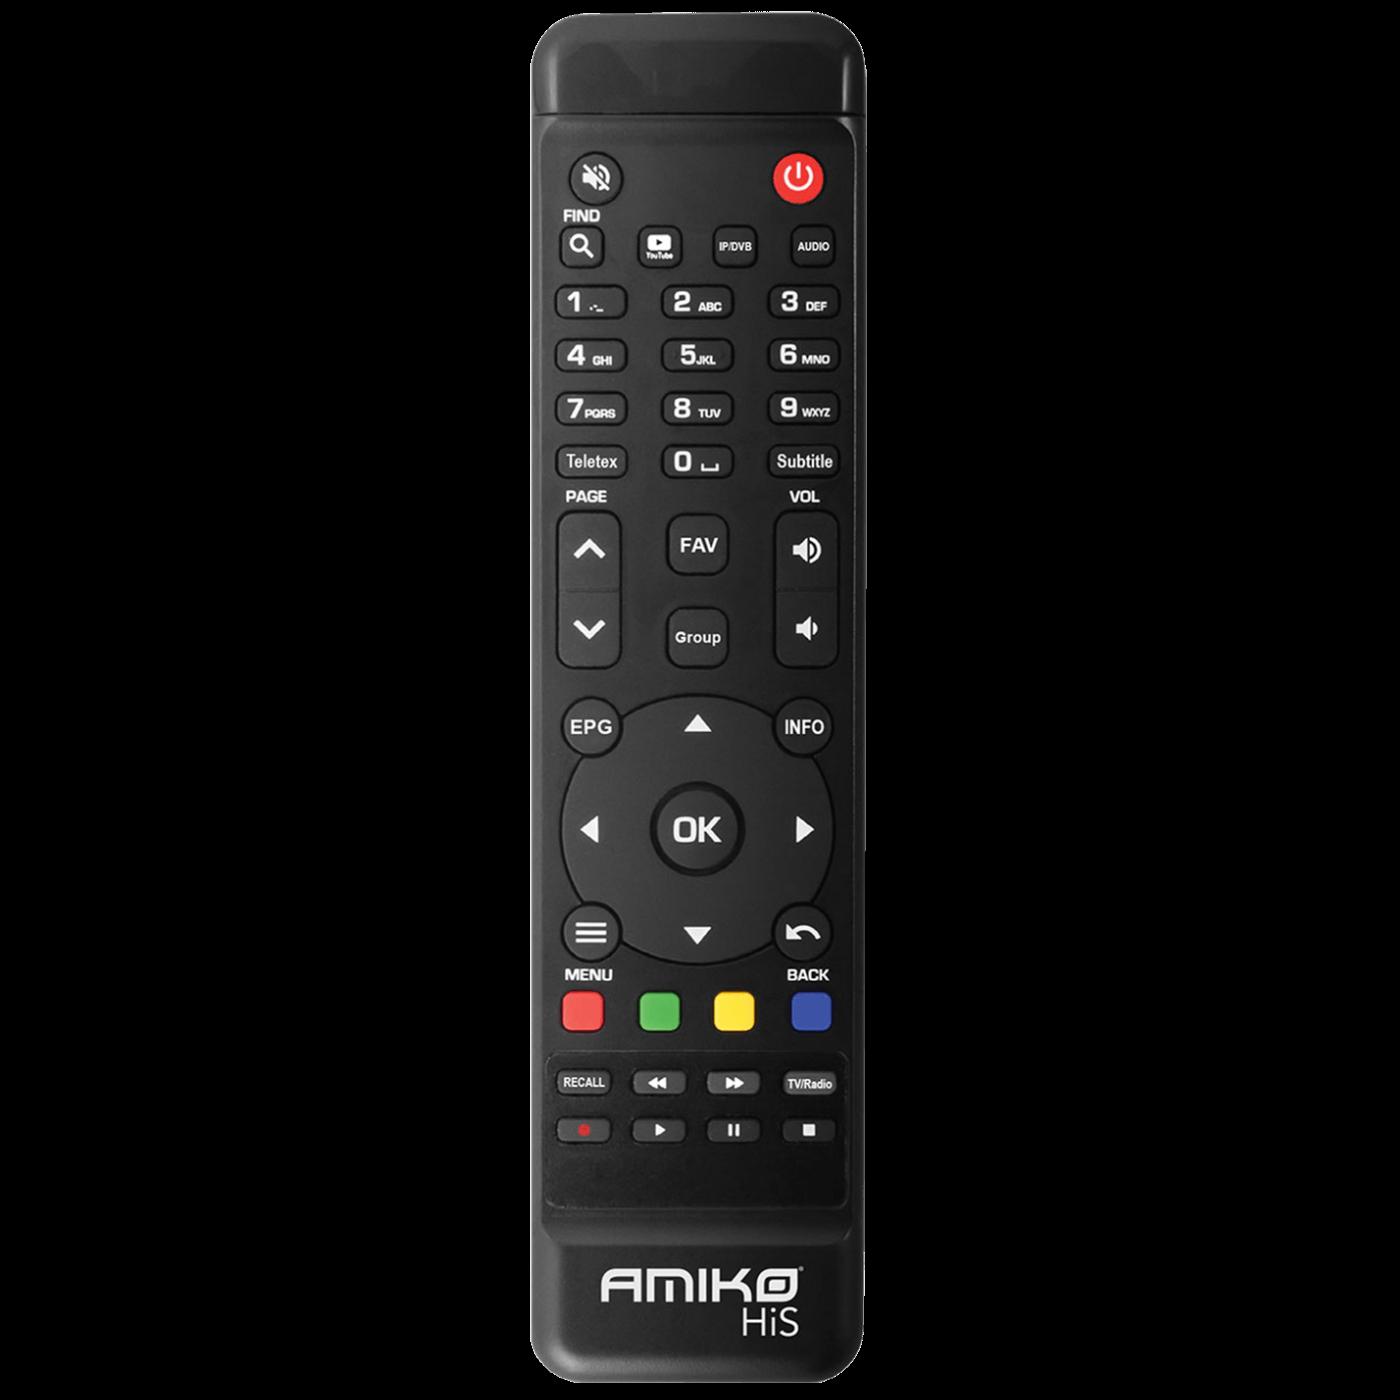 Prijemnik combo@Linux, FullHD, DVB-S2x2/T2/C, H.265